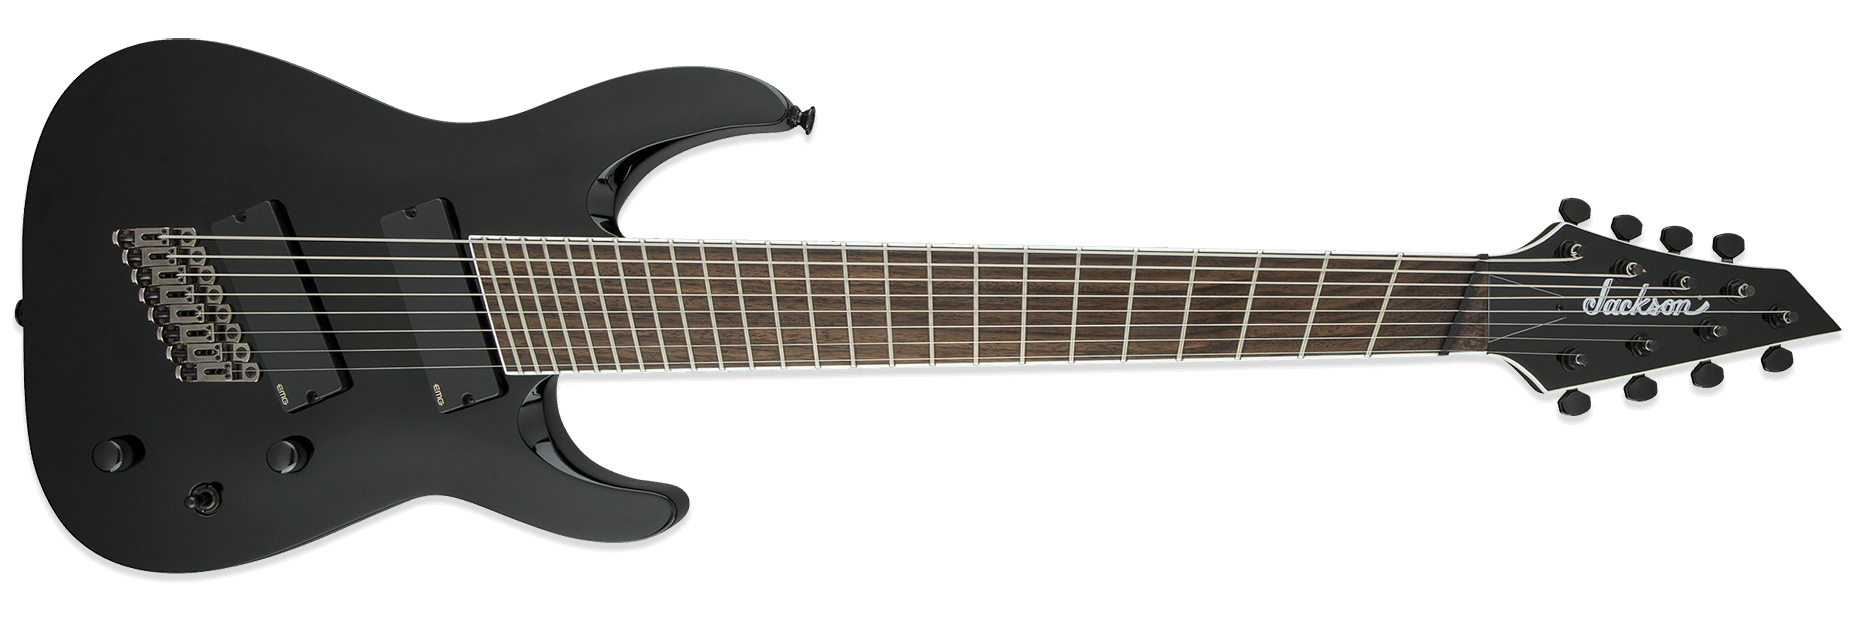 Jackson X Series Soloist Archtop SLAT8 MS